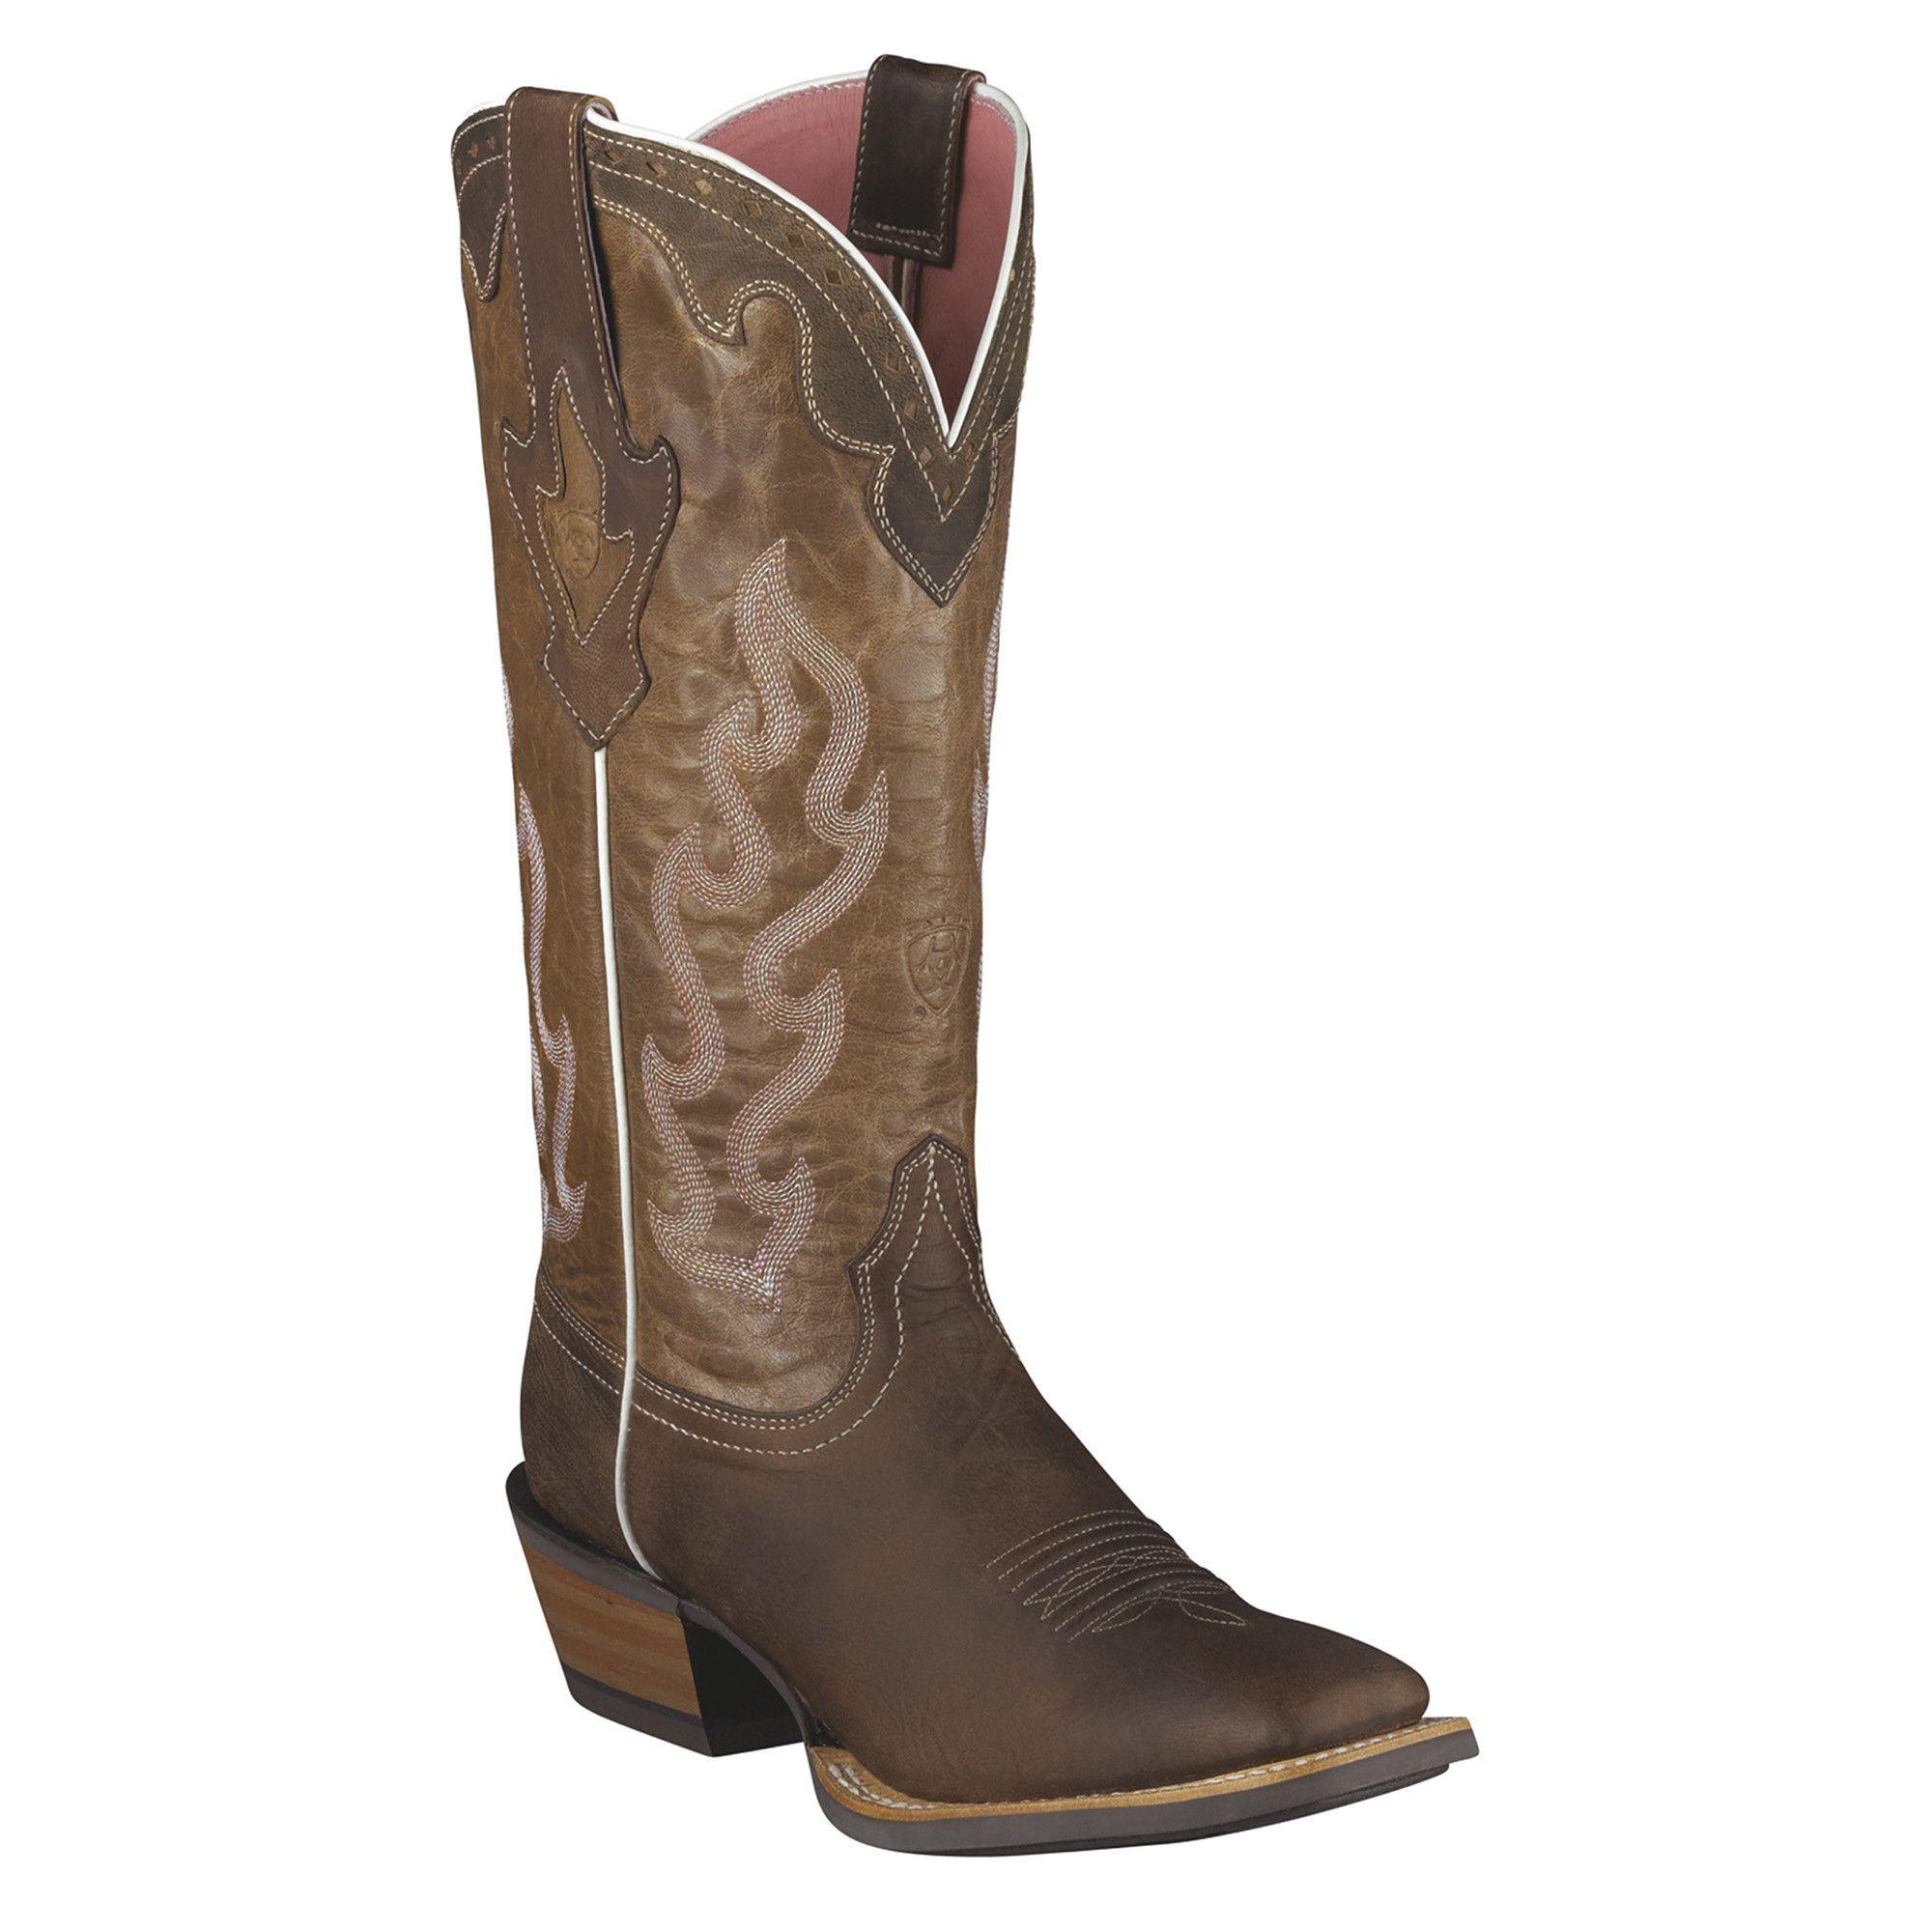 5c5940b5a7b Ariat Women s Crossfire Caliente Square Toe Boot